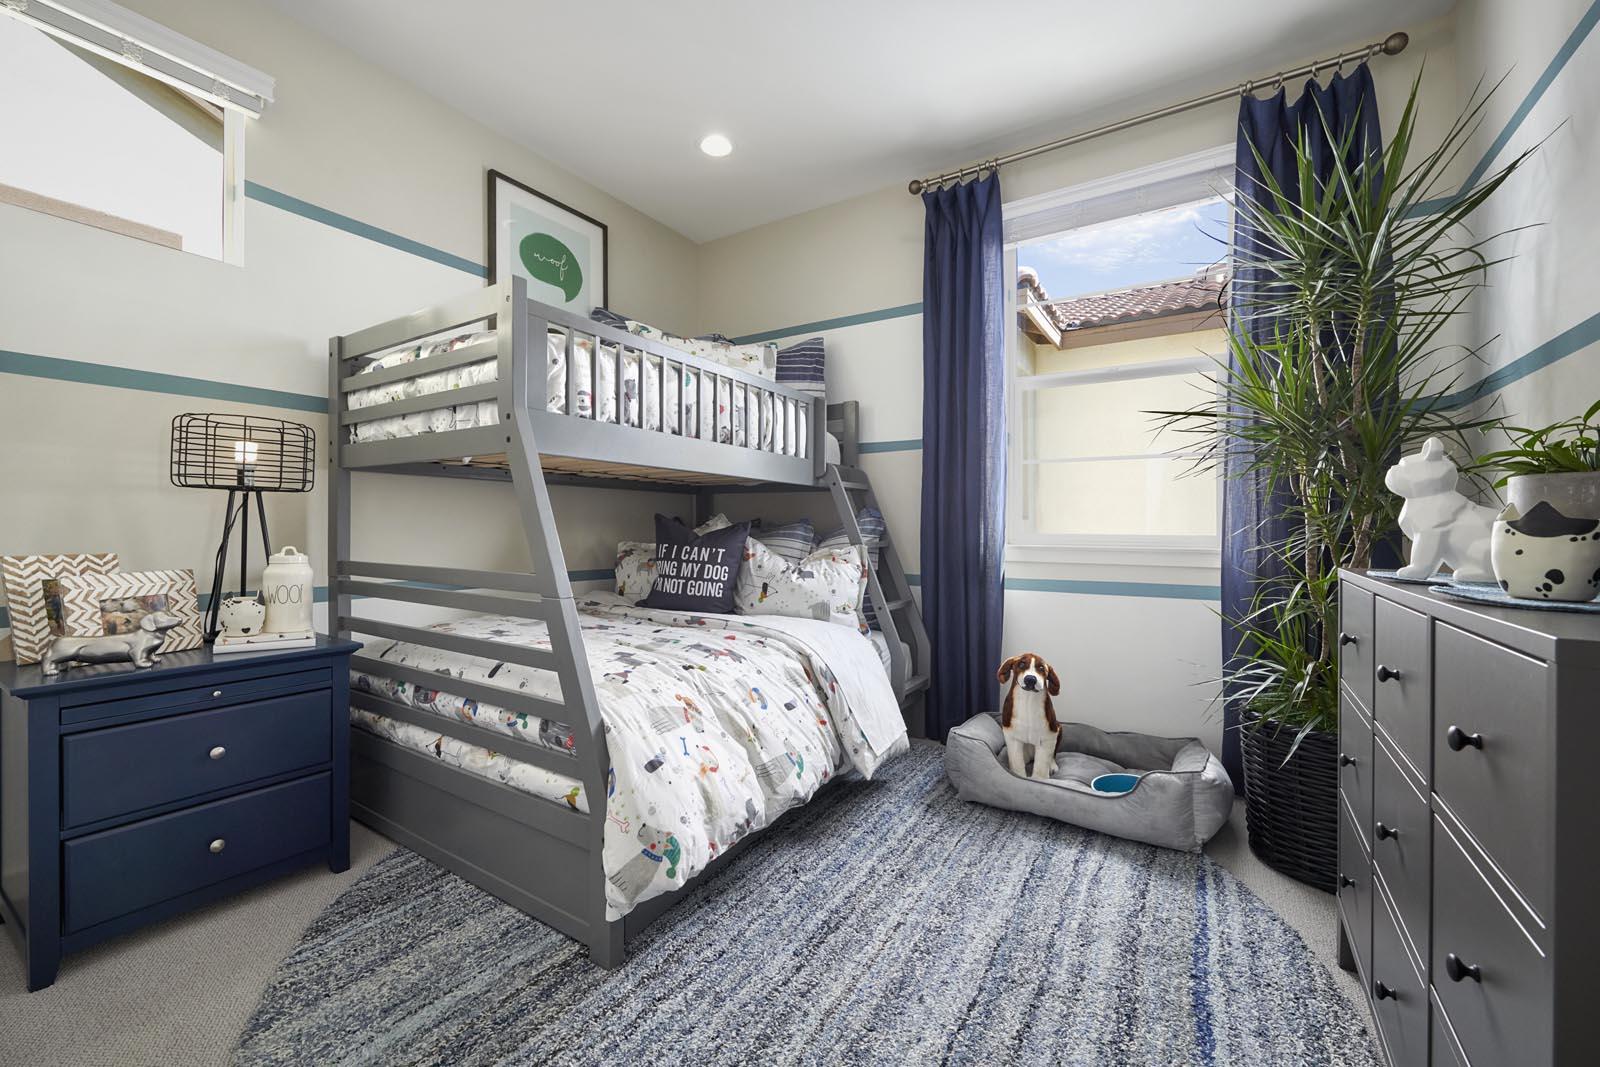 Bedroom   Residence 3   Lumin   New Homes in Rancho Cucamonga, CA   Van Daele Homes